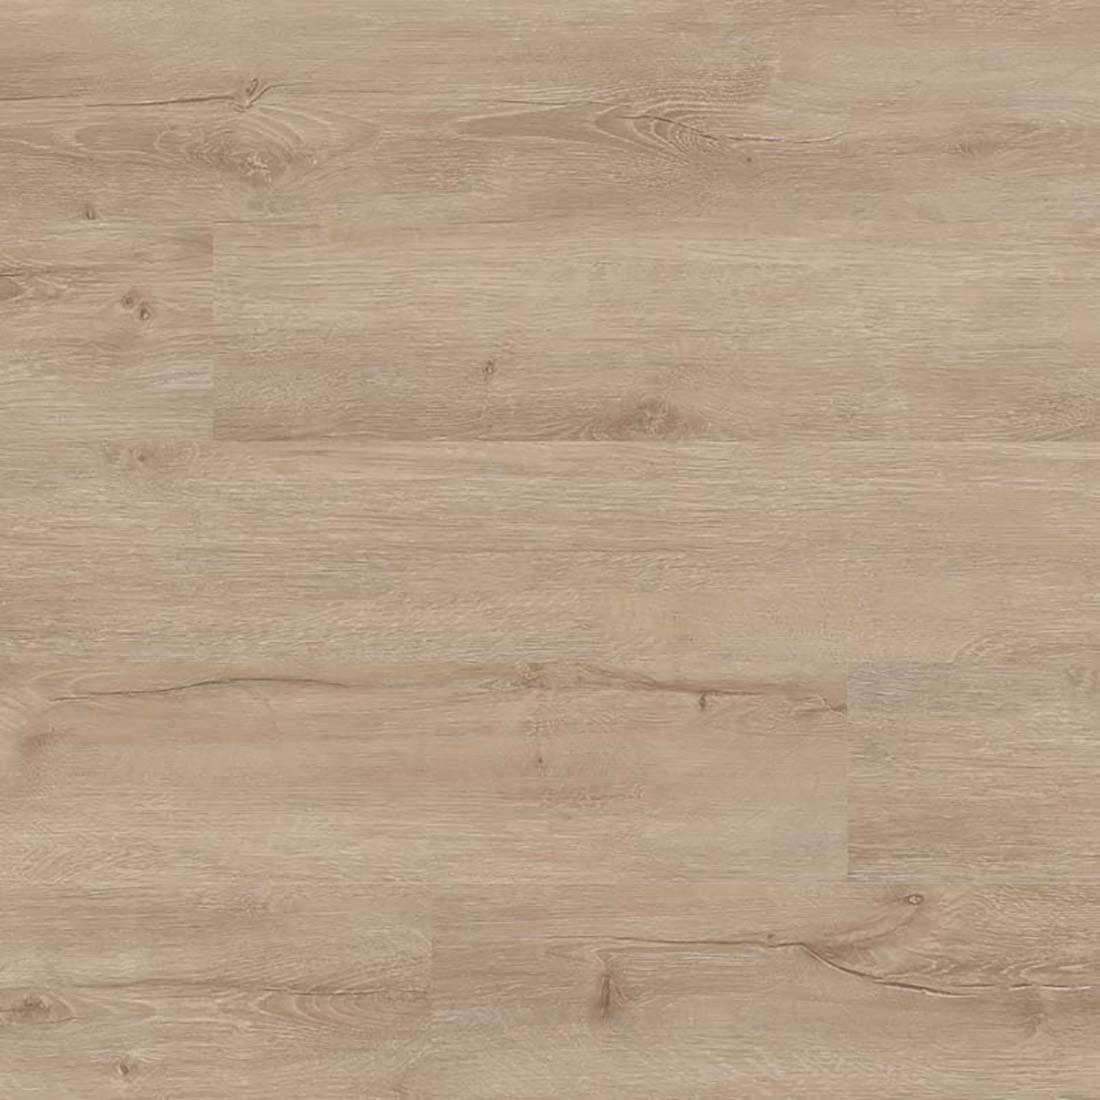 Warm Birch / 5mm / SPC / Click Lock Vinyl Planks - 5mm SPC Click Lock - Lowcountry Collection 0